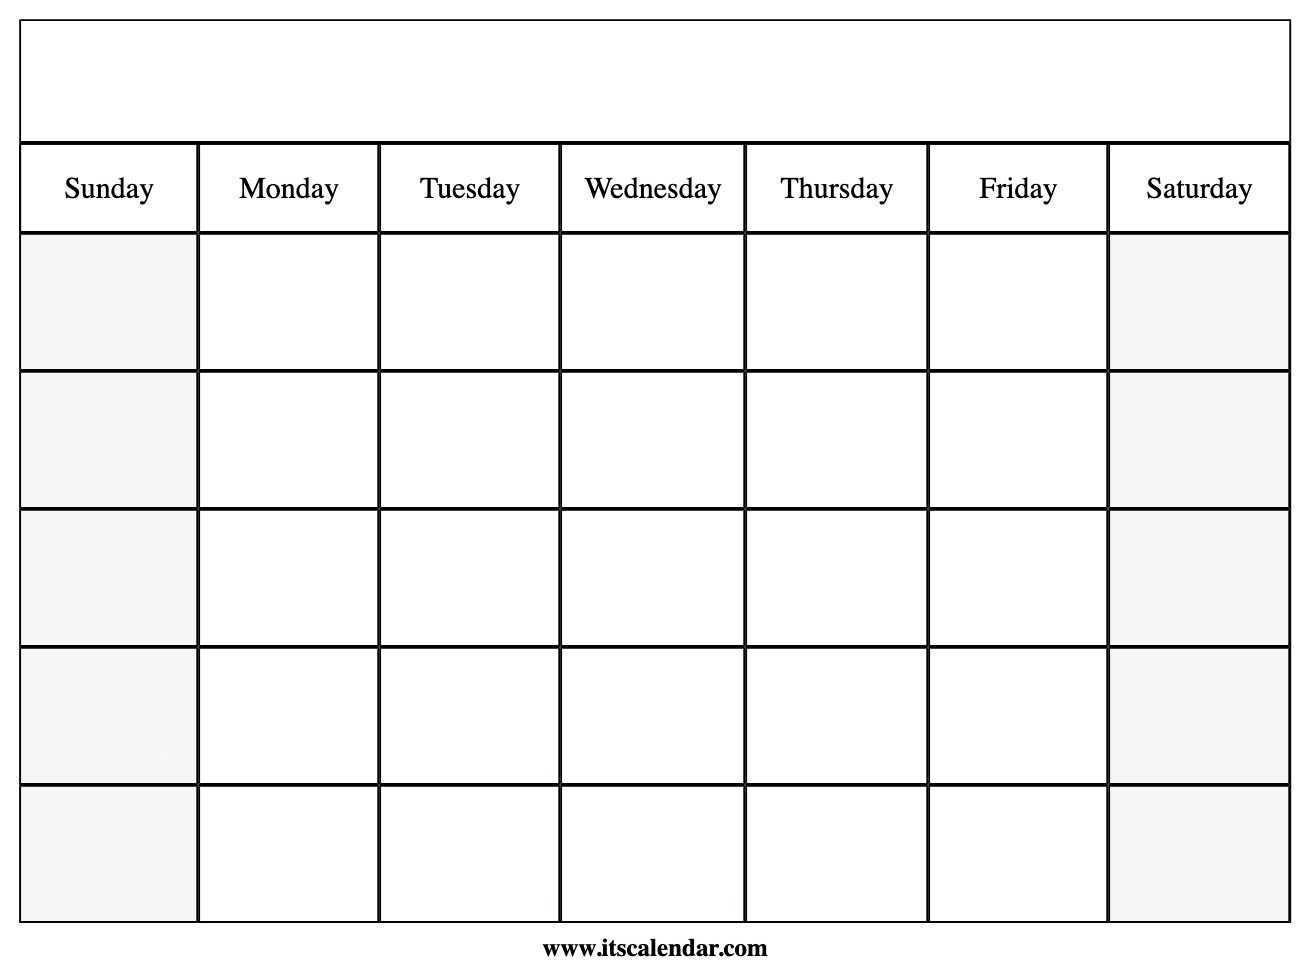 Printable Blank Calendar regarding Blank Calender Template